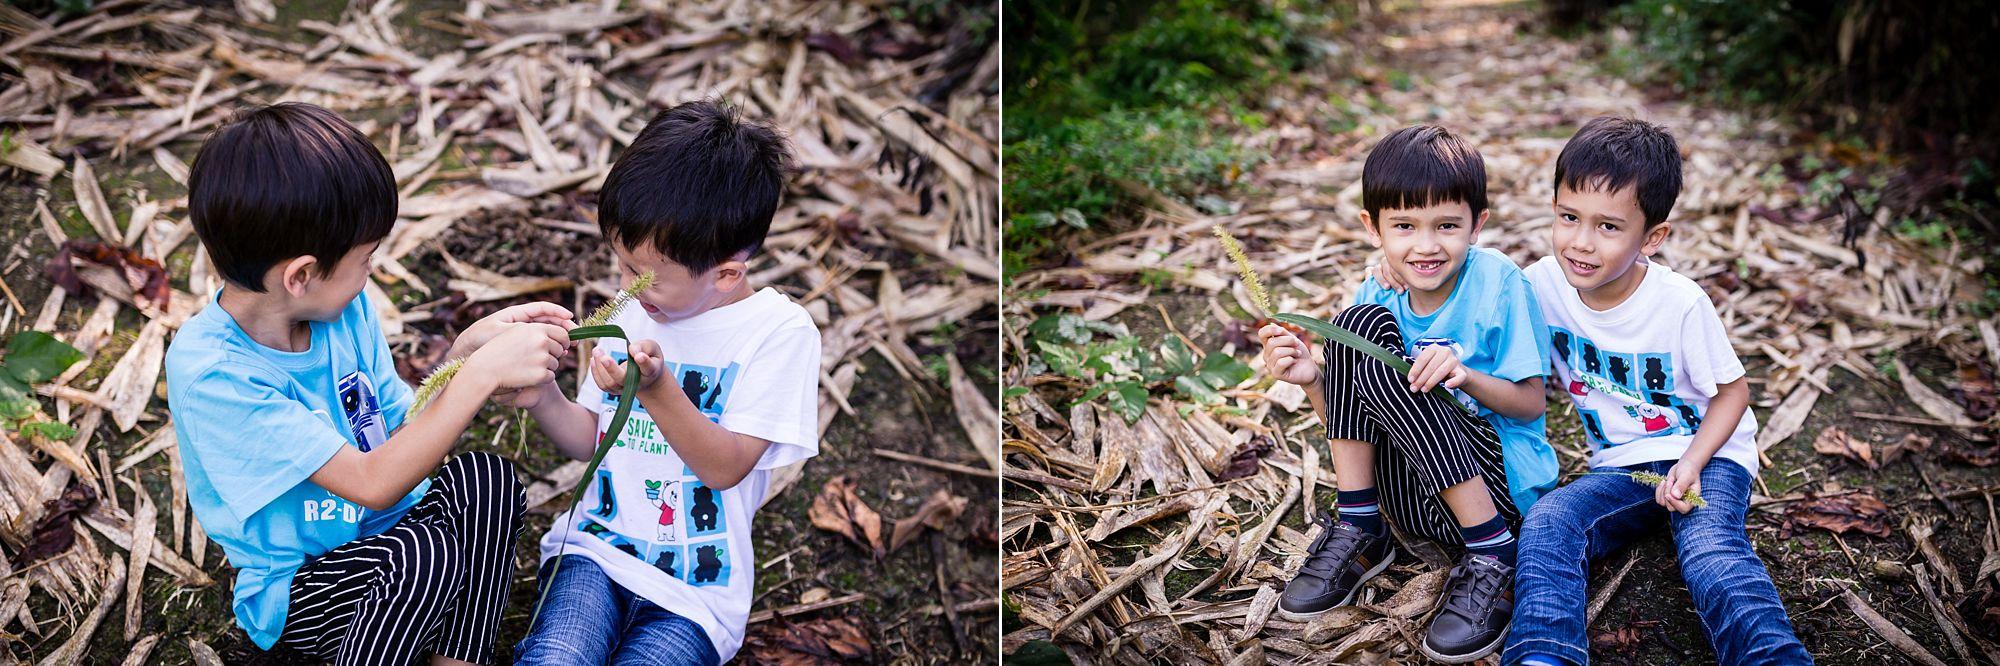 Taiwan_Family_Lifestyle_Photographer_Hunnicutt_Photography_0024